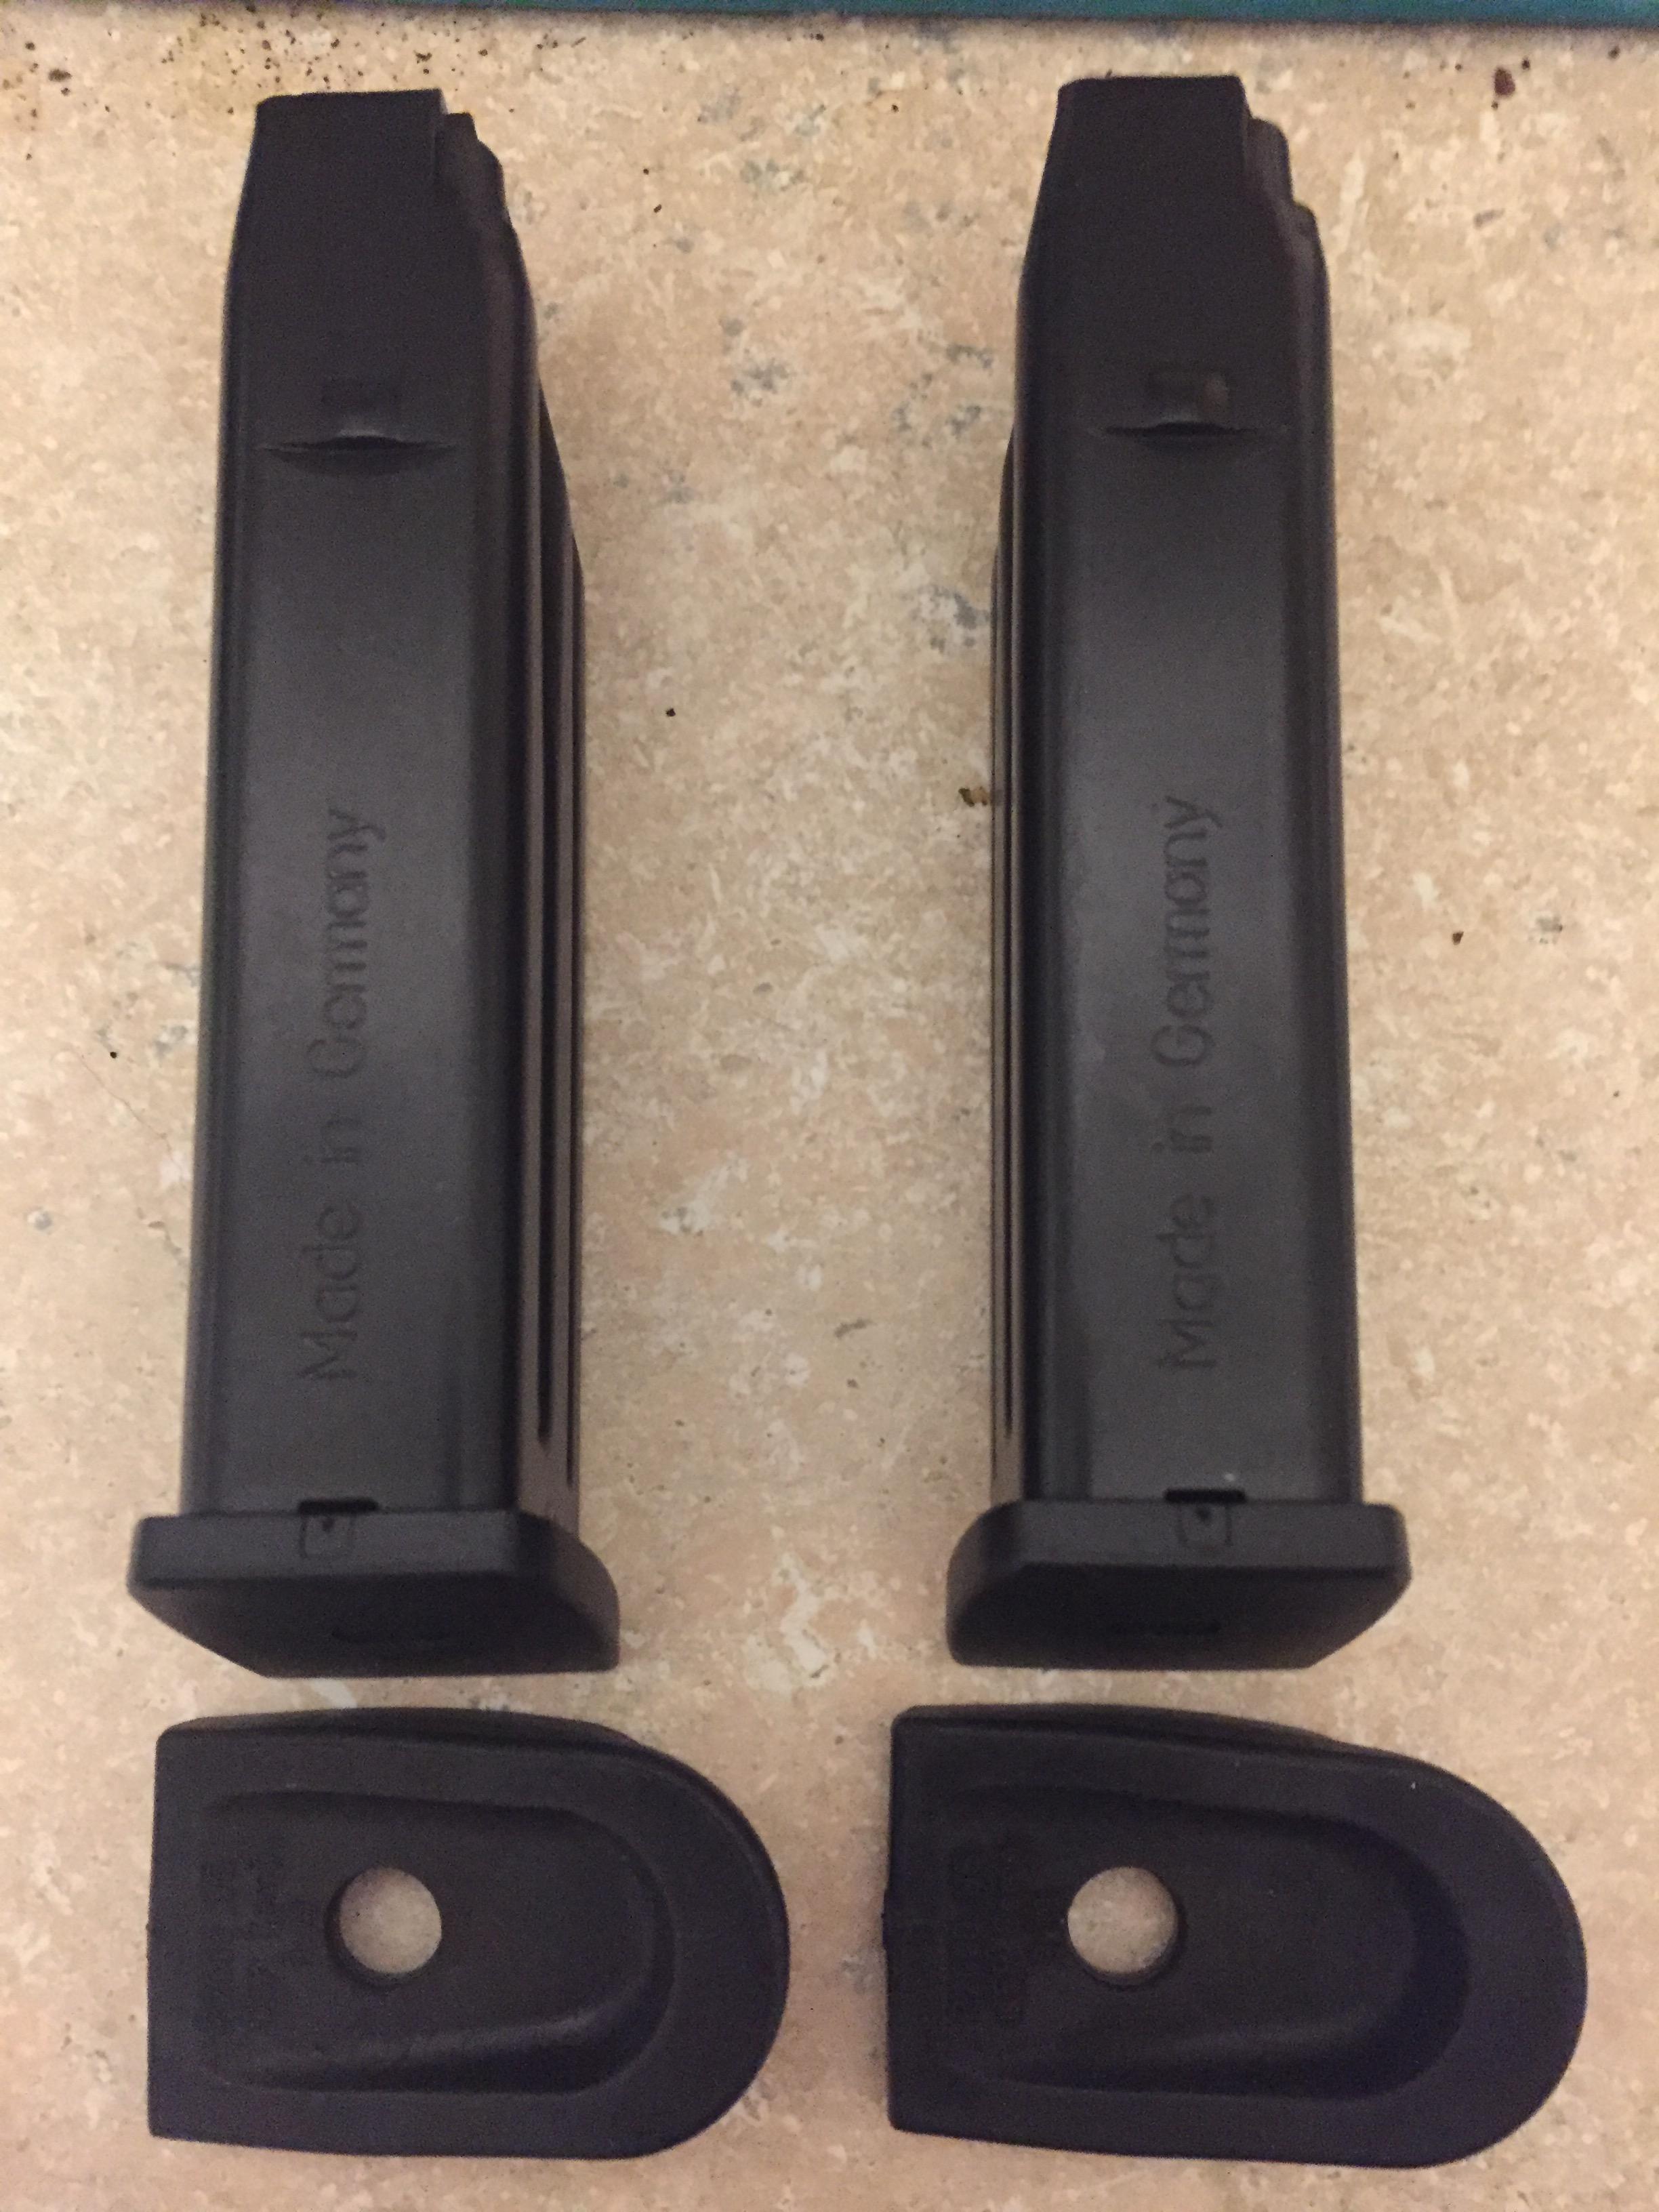 WTS: USP Compact Magazines, Match Trigger Kit, Sight Pusher-img_1069.jpg